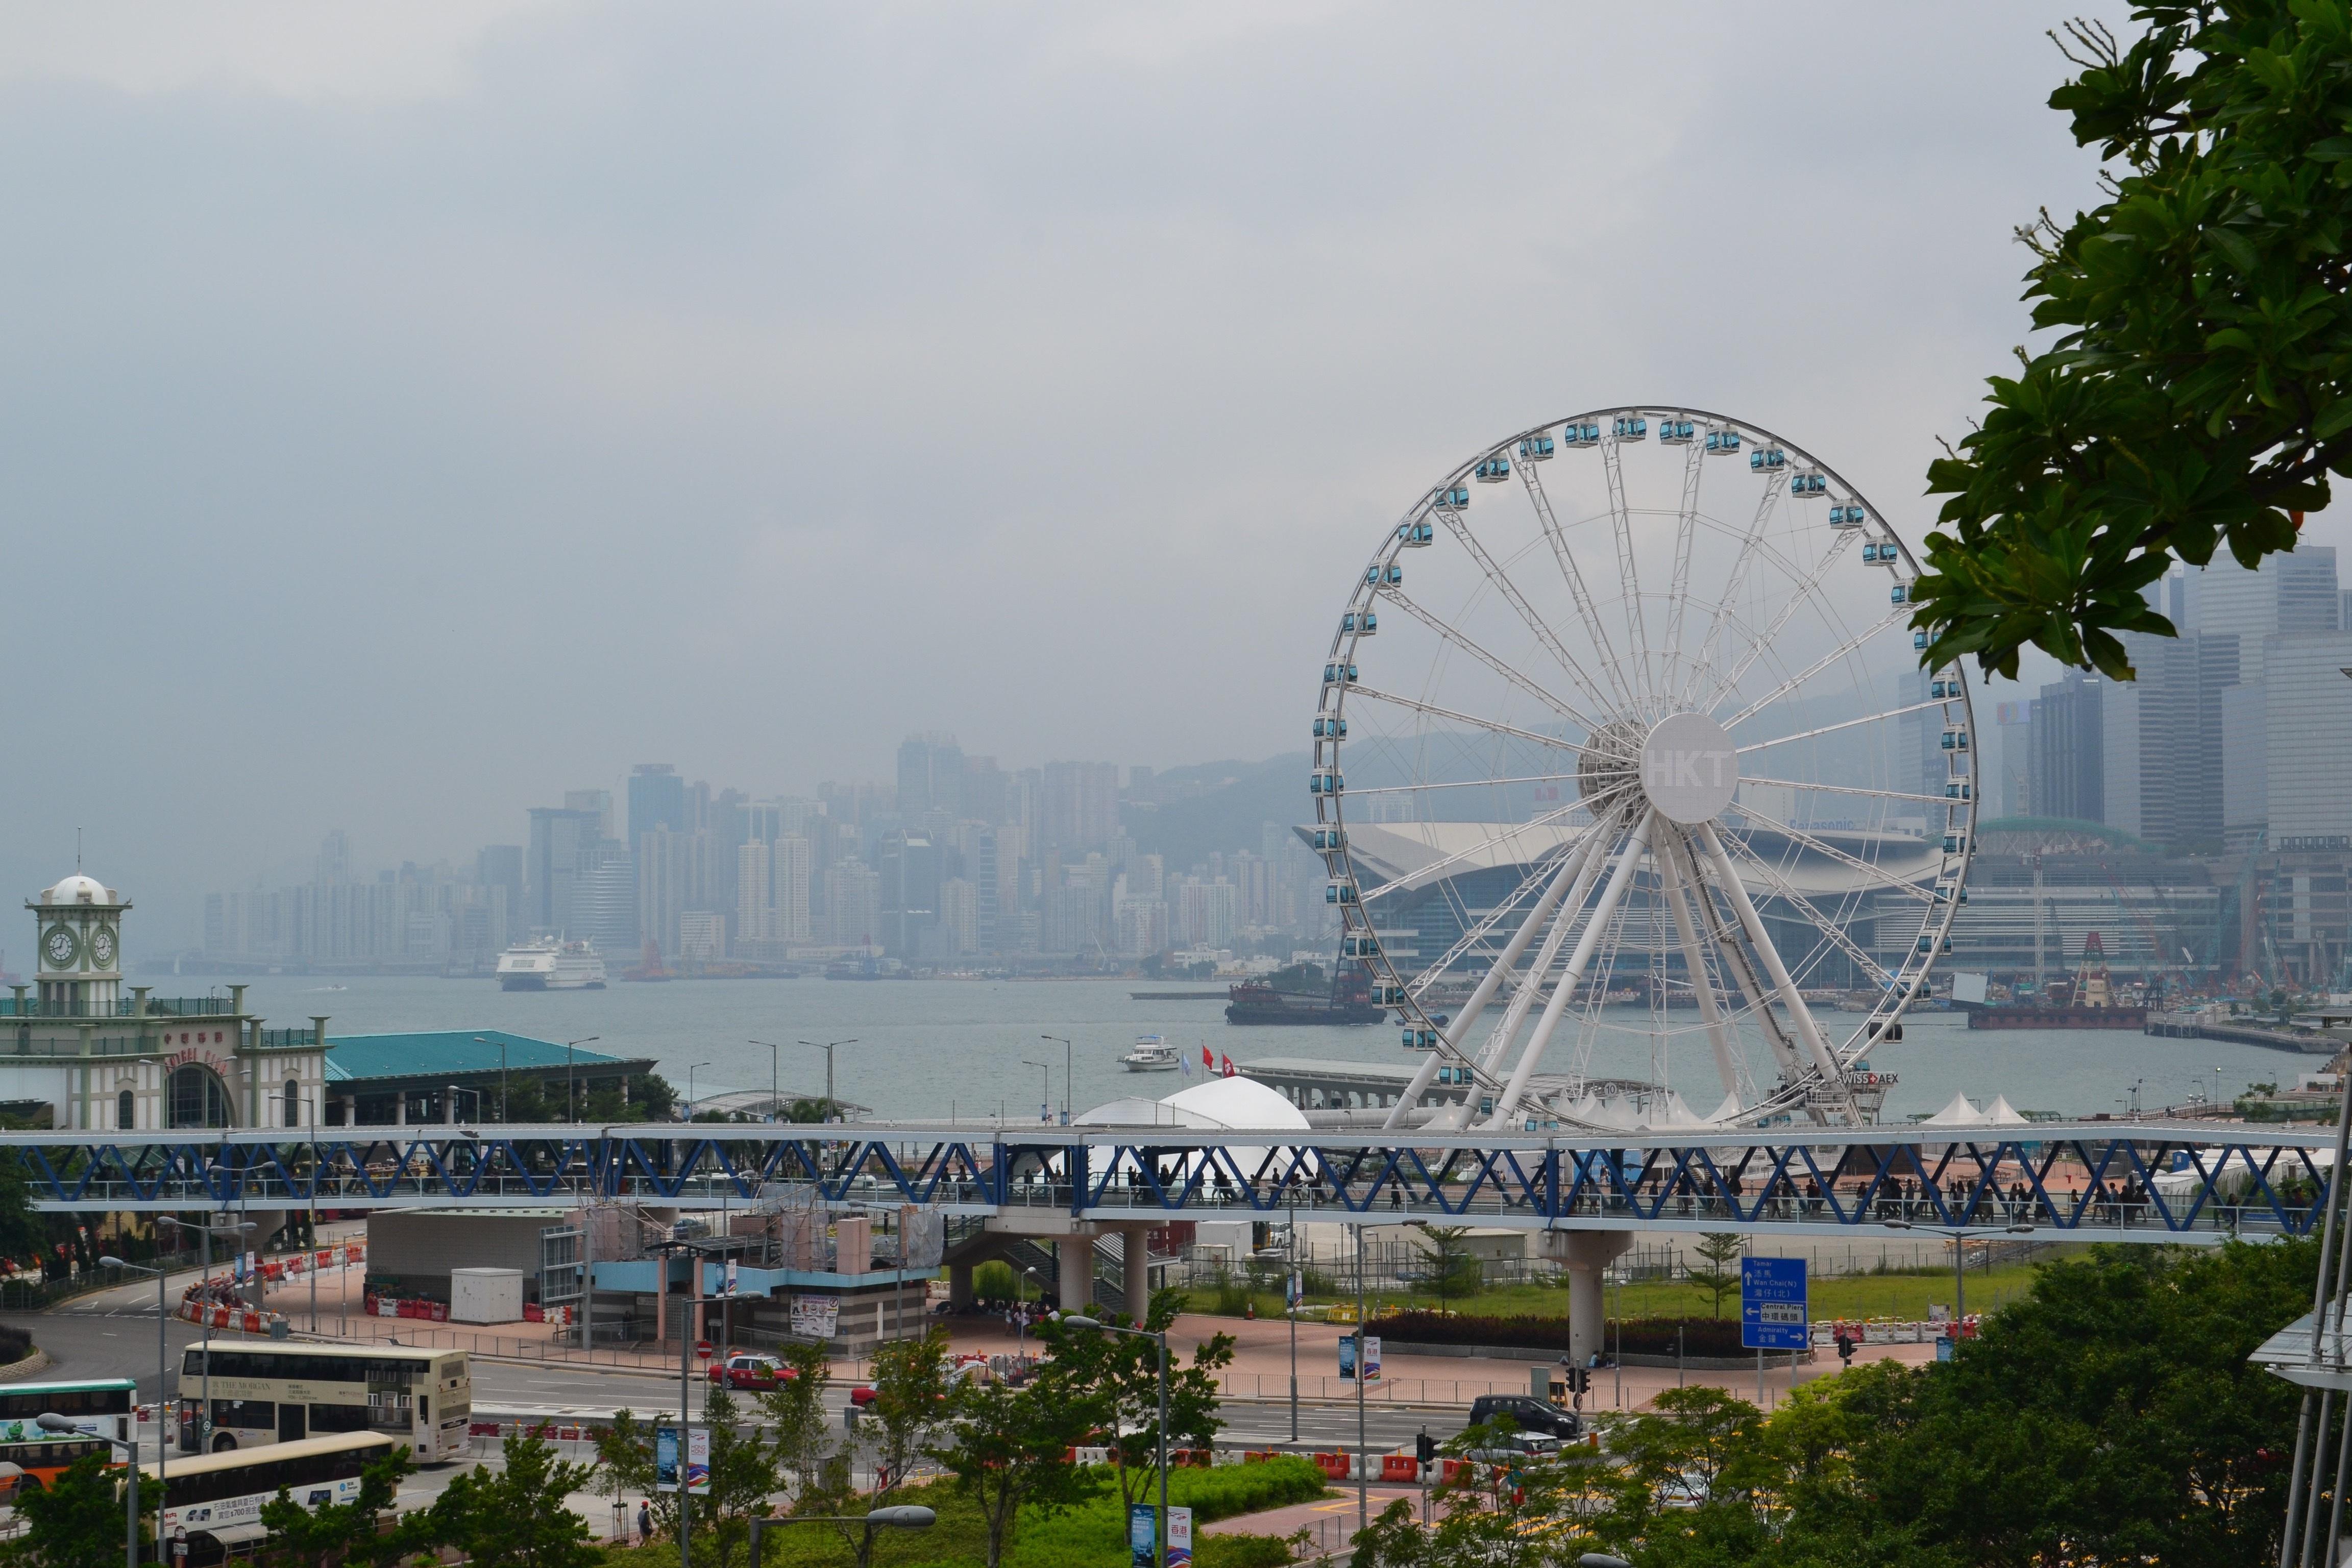 Fotos Gratis Estructura Rueda De Ferris Parque De